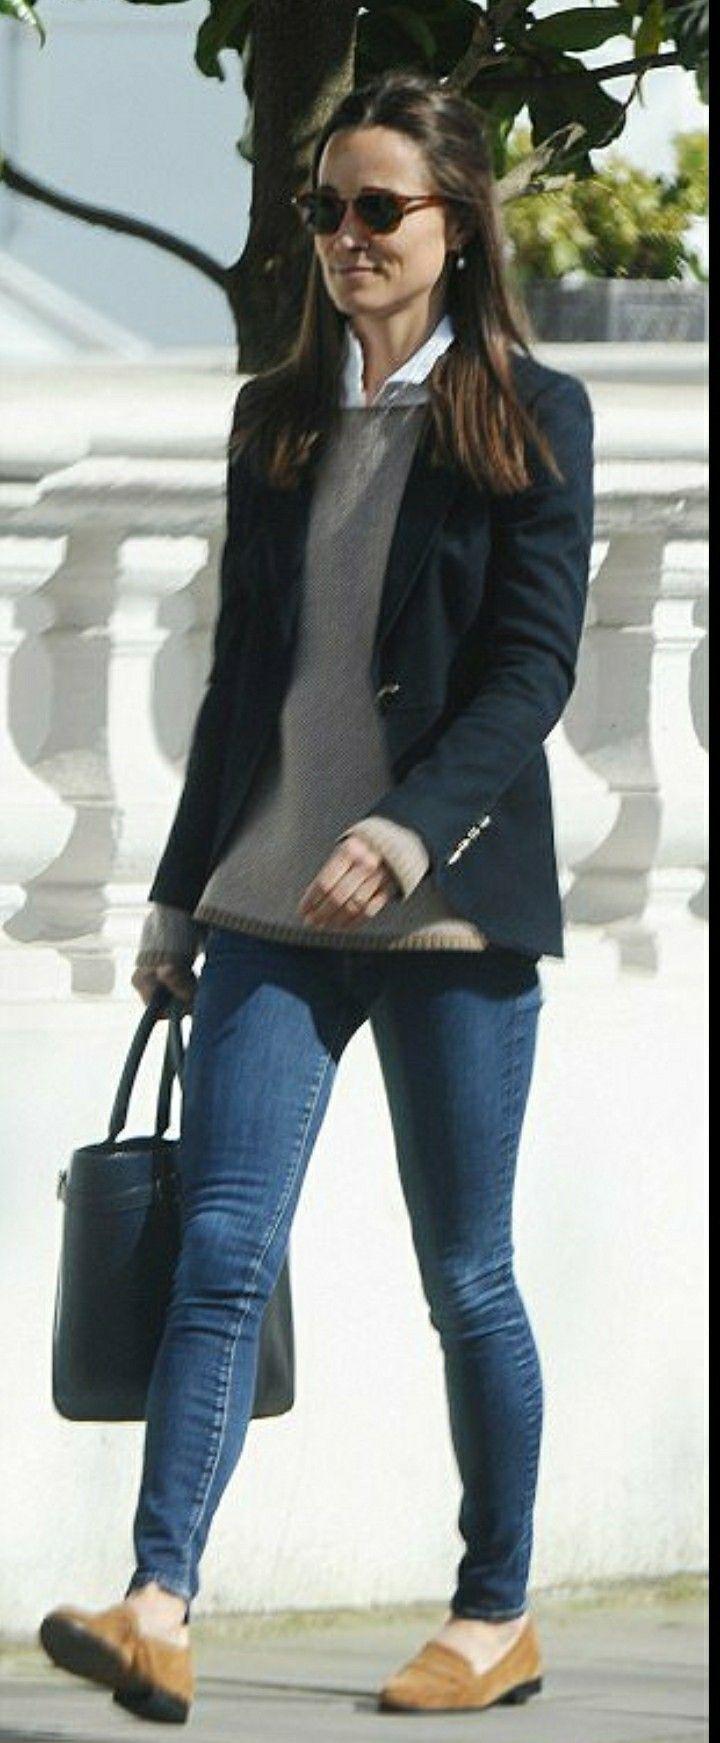 Pippa Middleton à Londres aujourd hui, le 7 avril 2017 …   Estilo ... 16e199b152